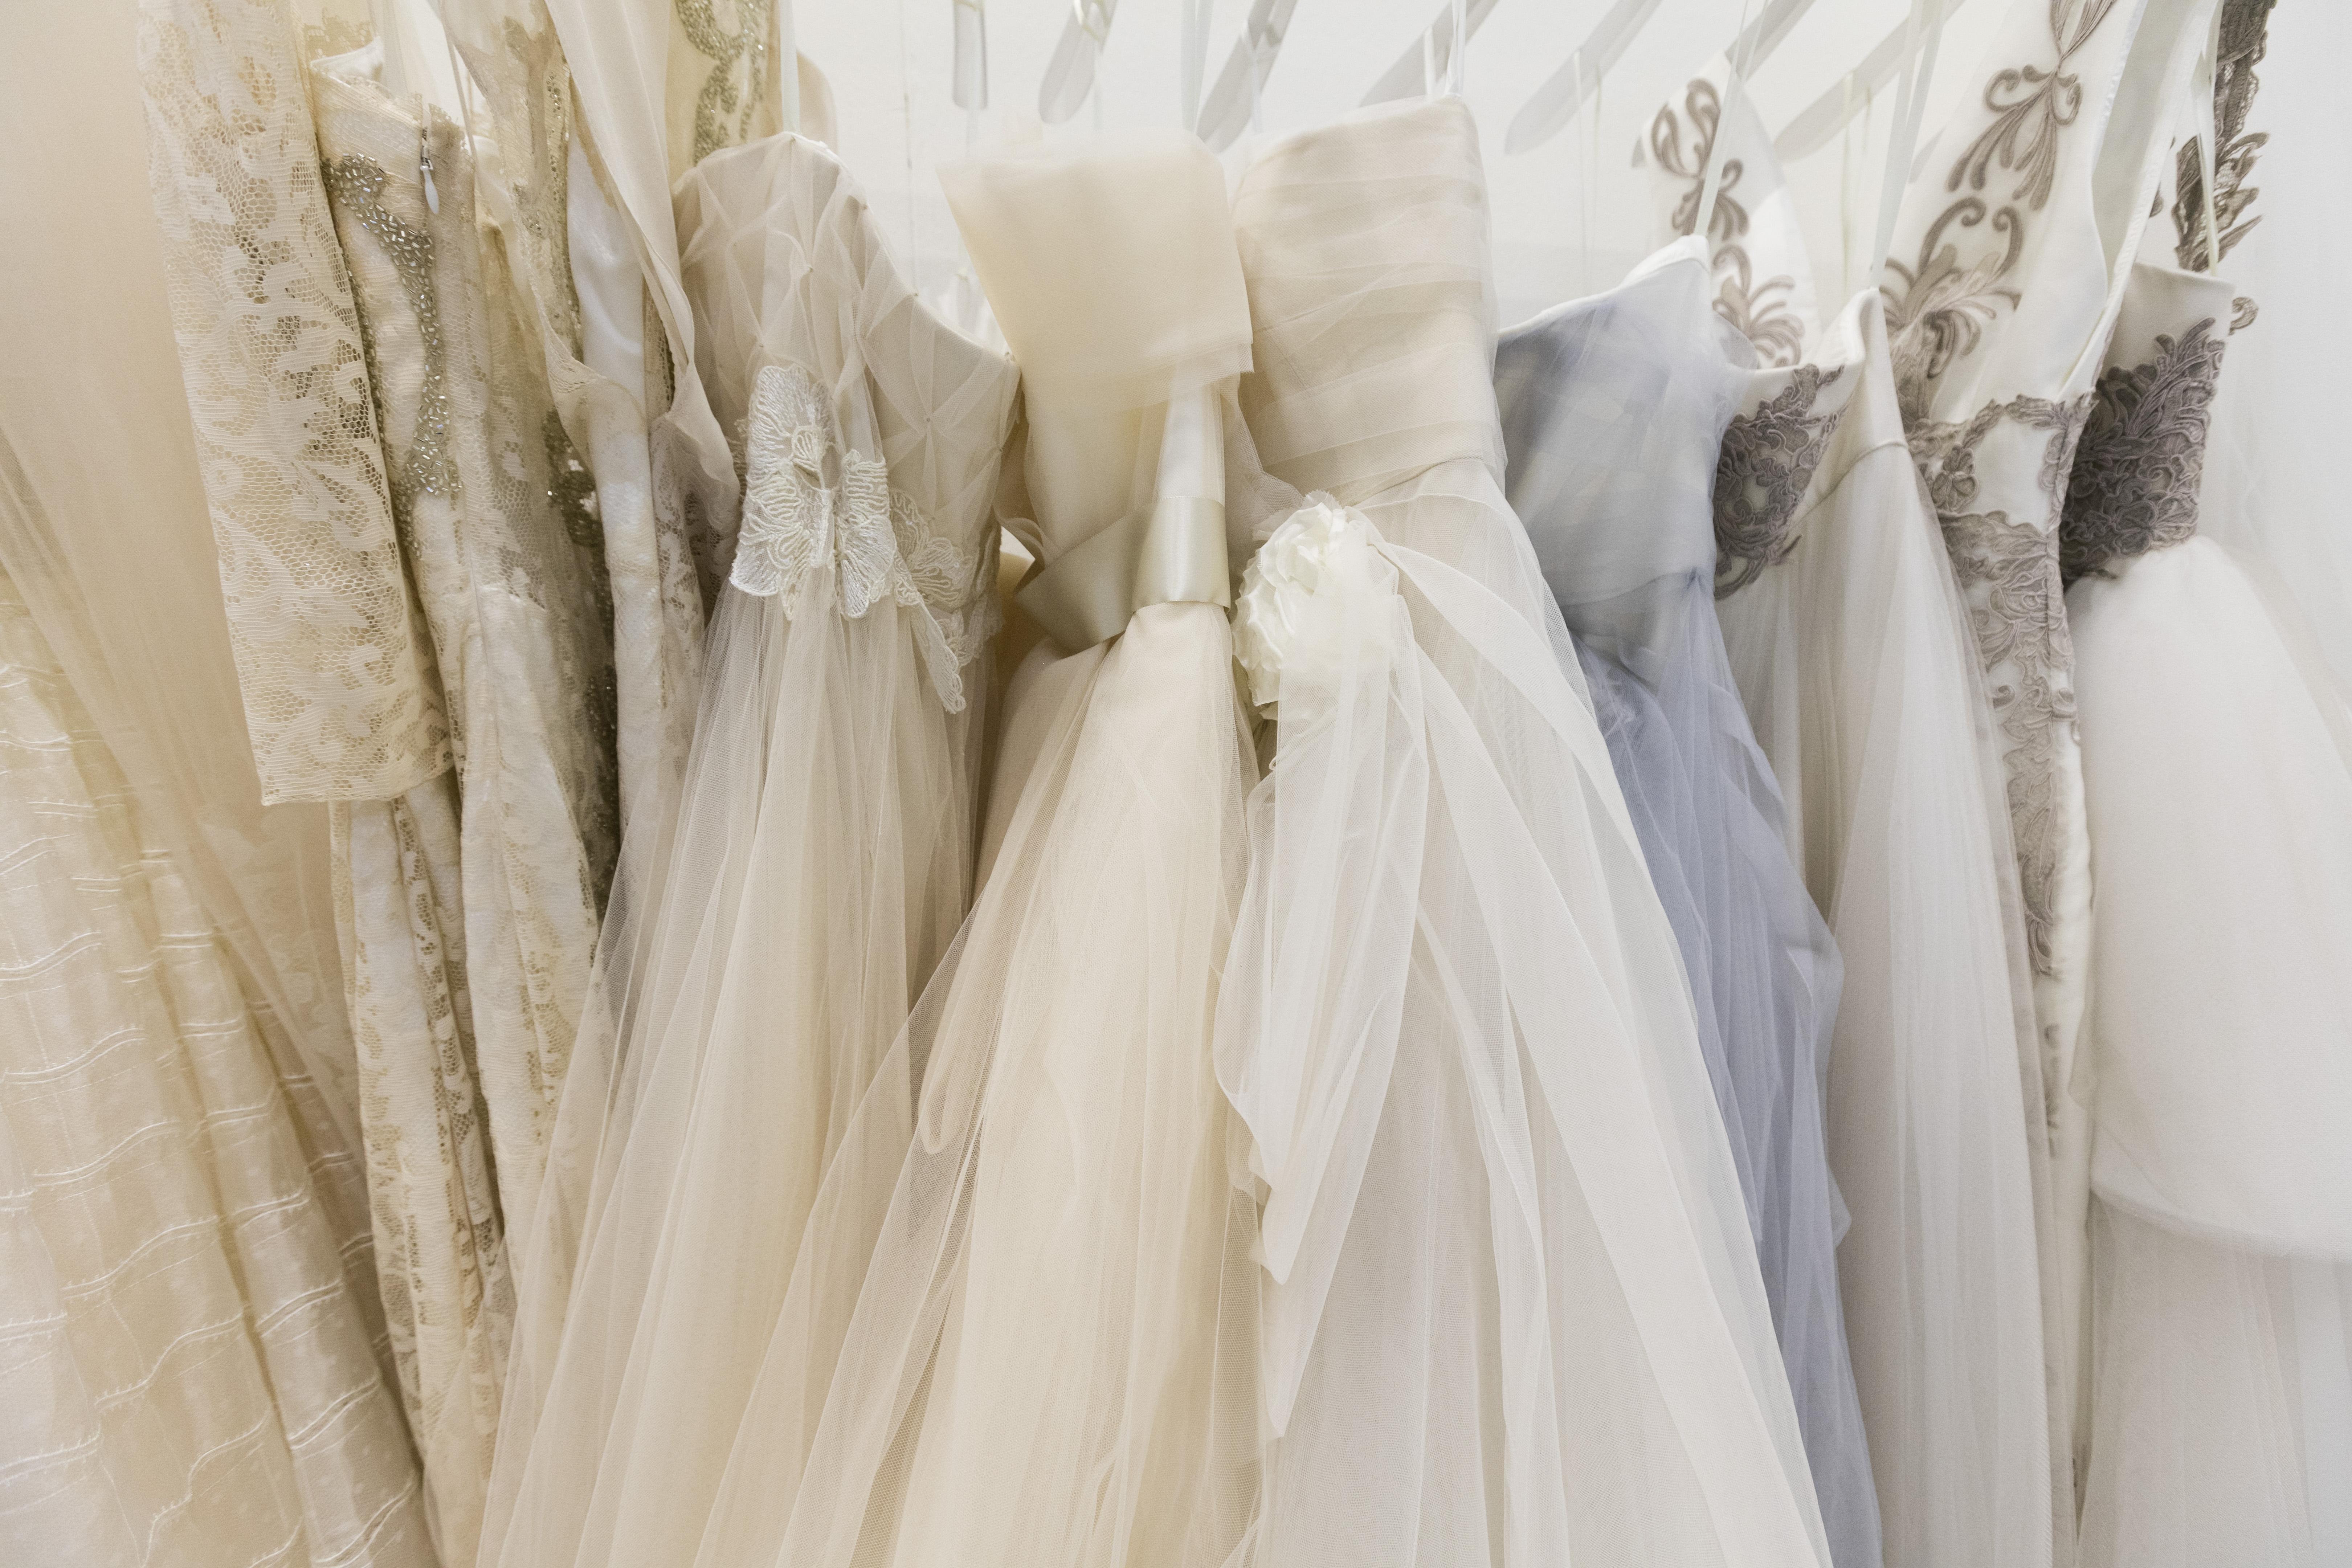 Inside the wedding and ceremony wear trade fair Si Sposaitalia Collezioni at Fieramilanocity in Milan.